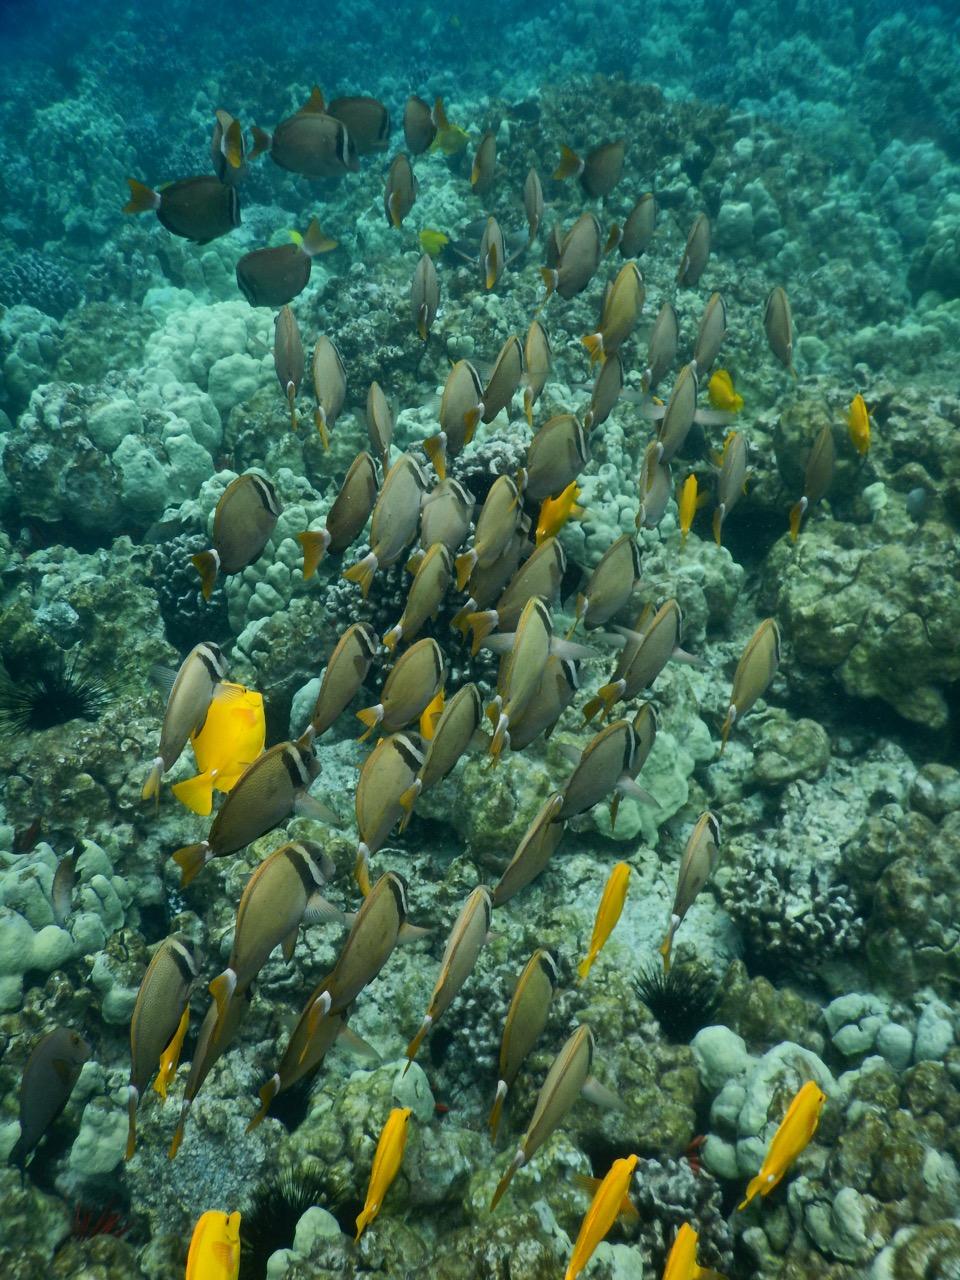 A school of Whitebar Surgeonfish.